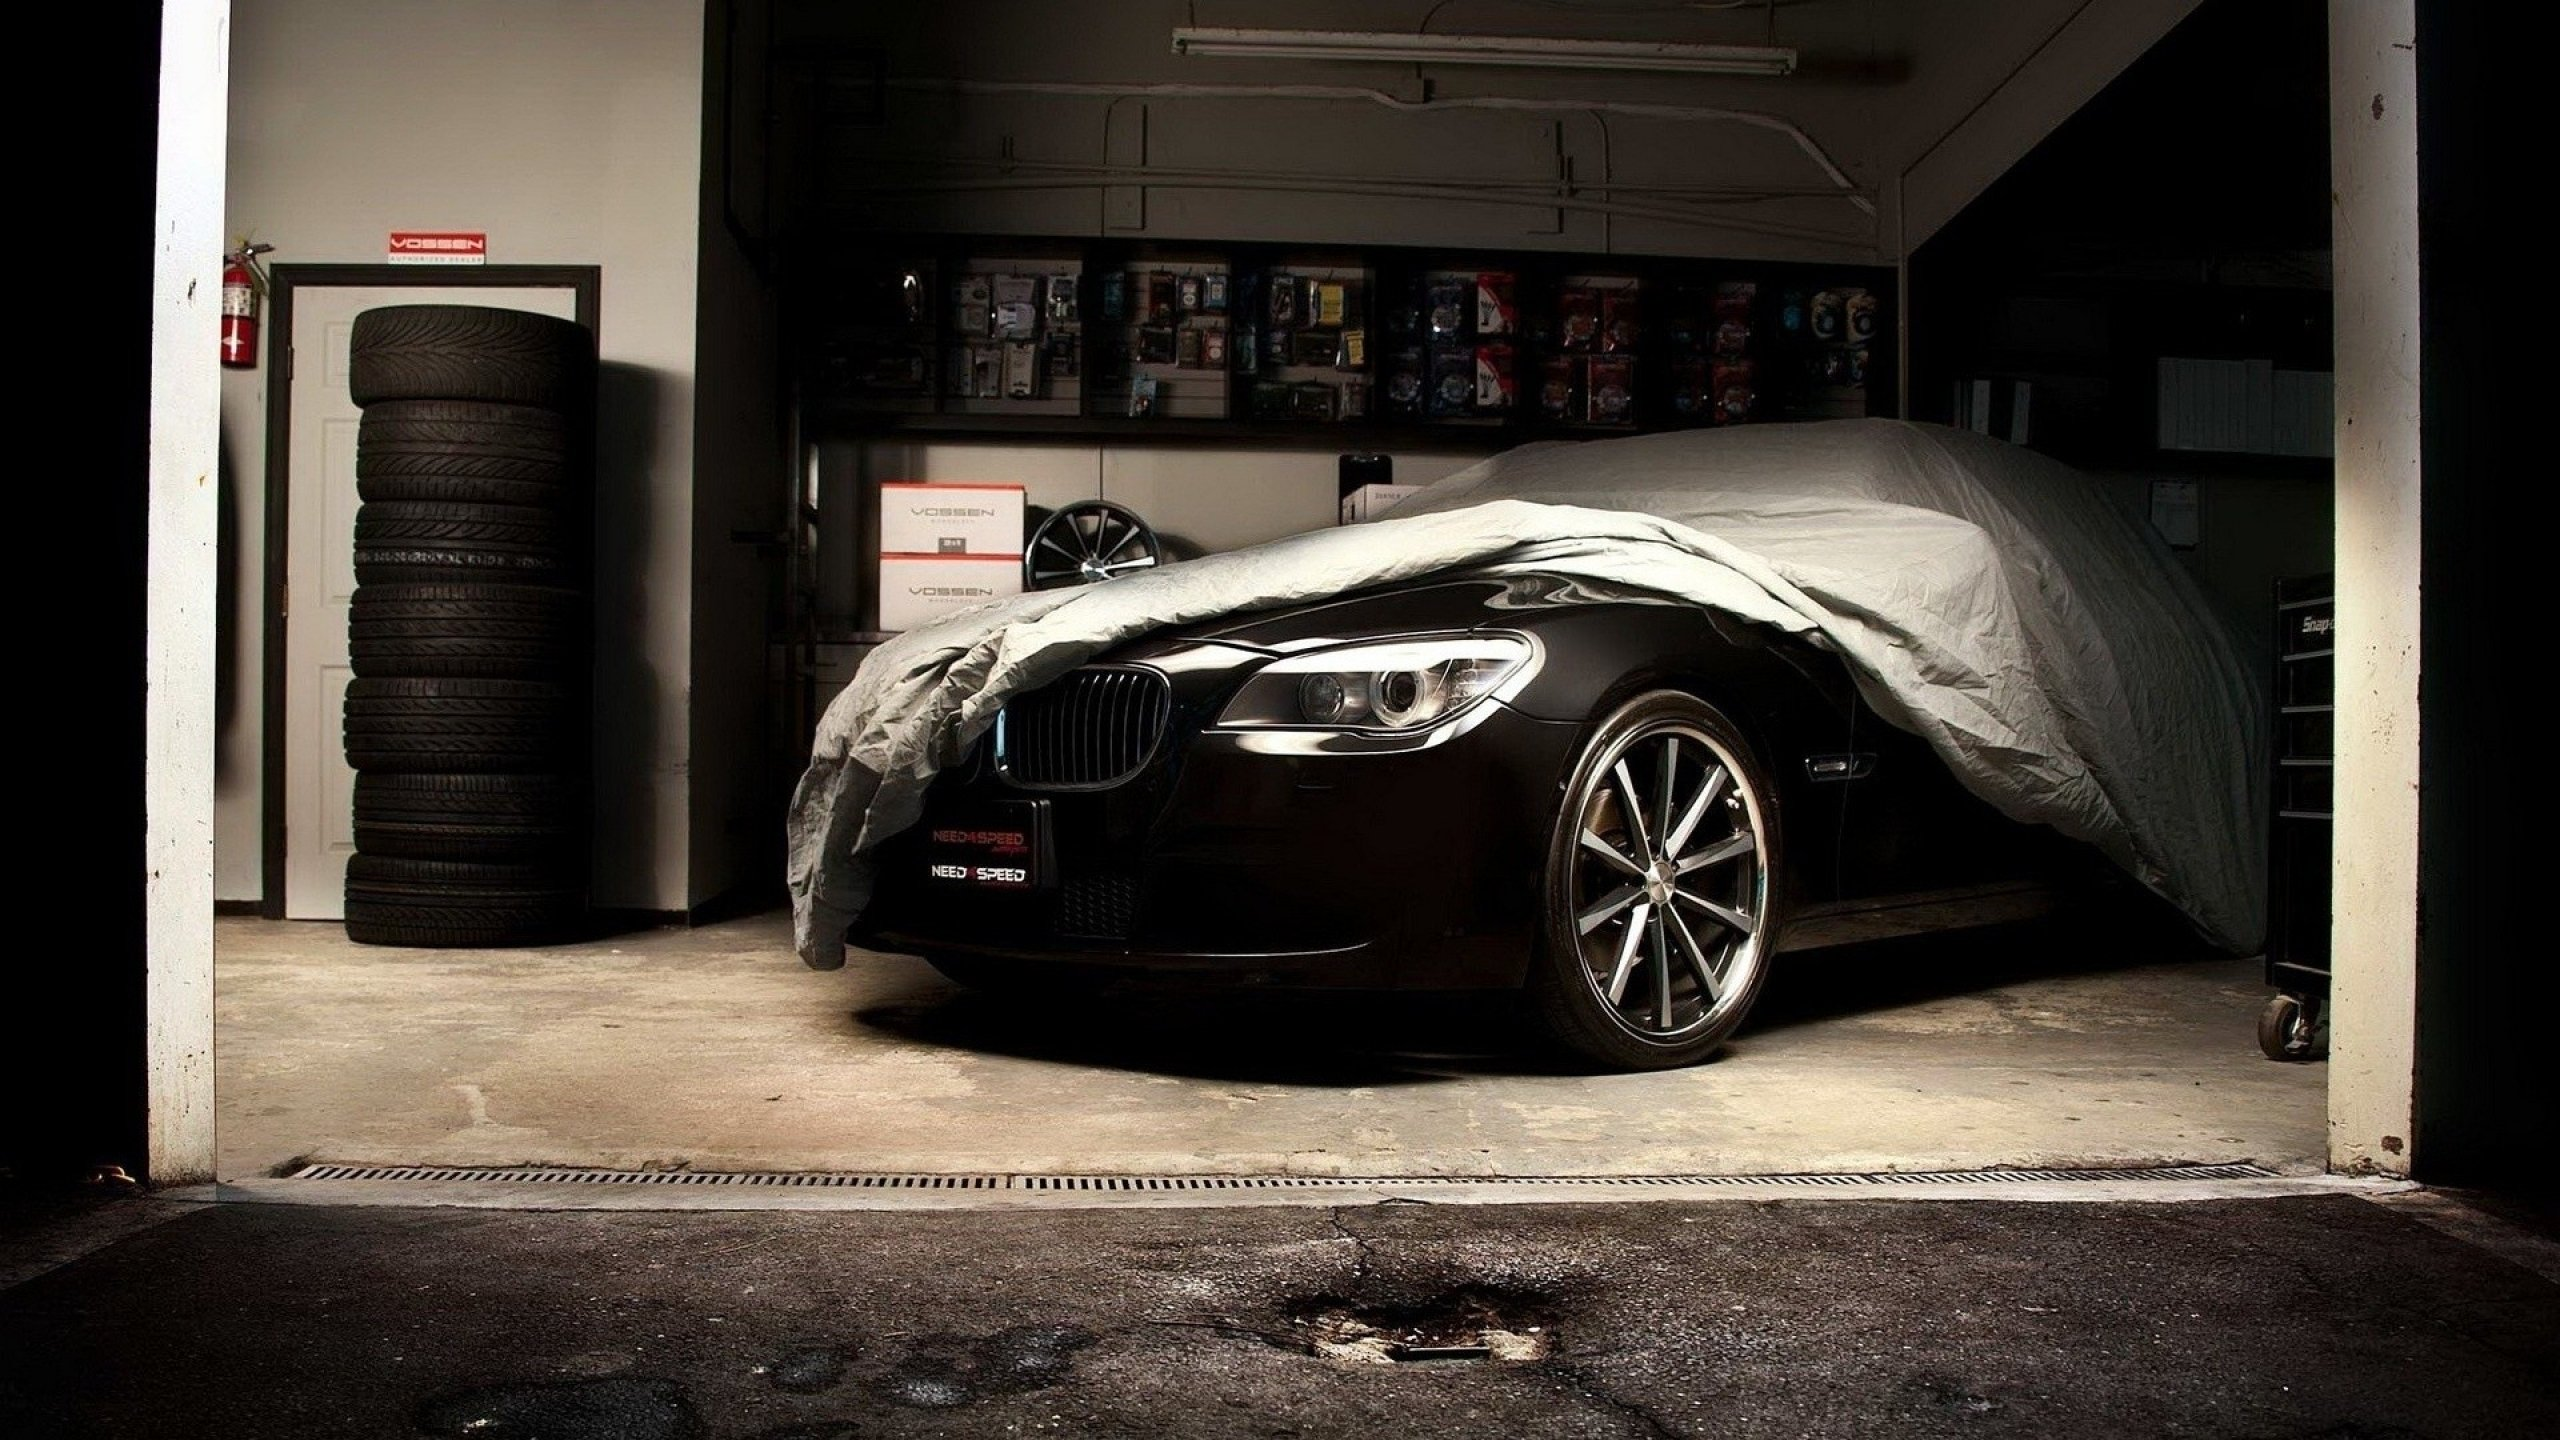 Bmw Wallpaper Garage 2560x1440 Download Hd Wallpaper Wallpapertip